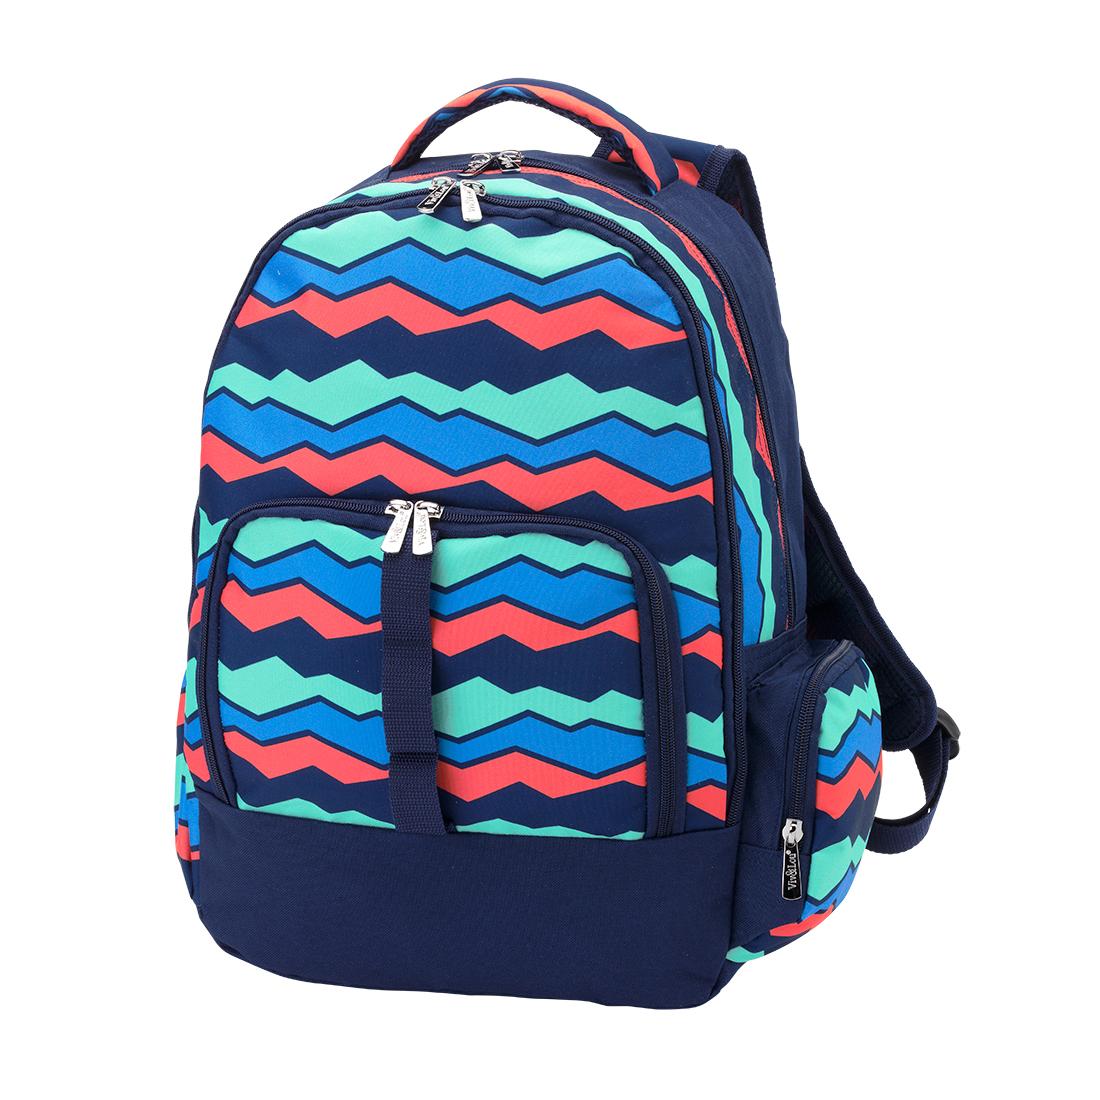 monogram backpack personalized backpacks